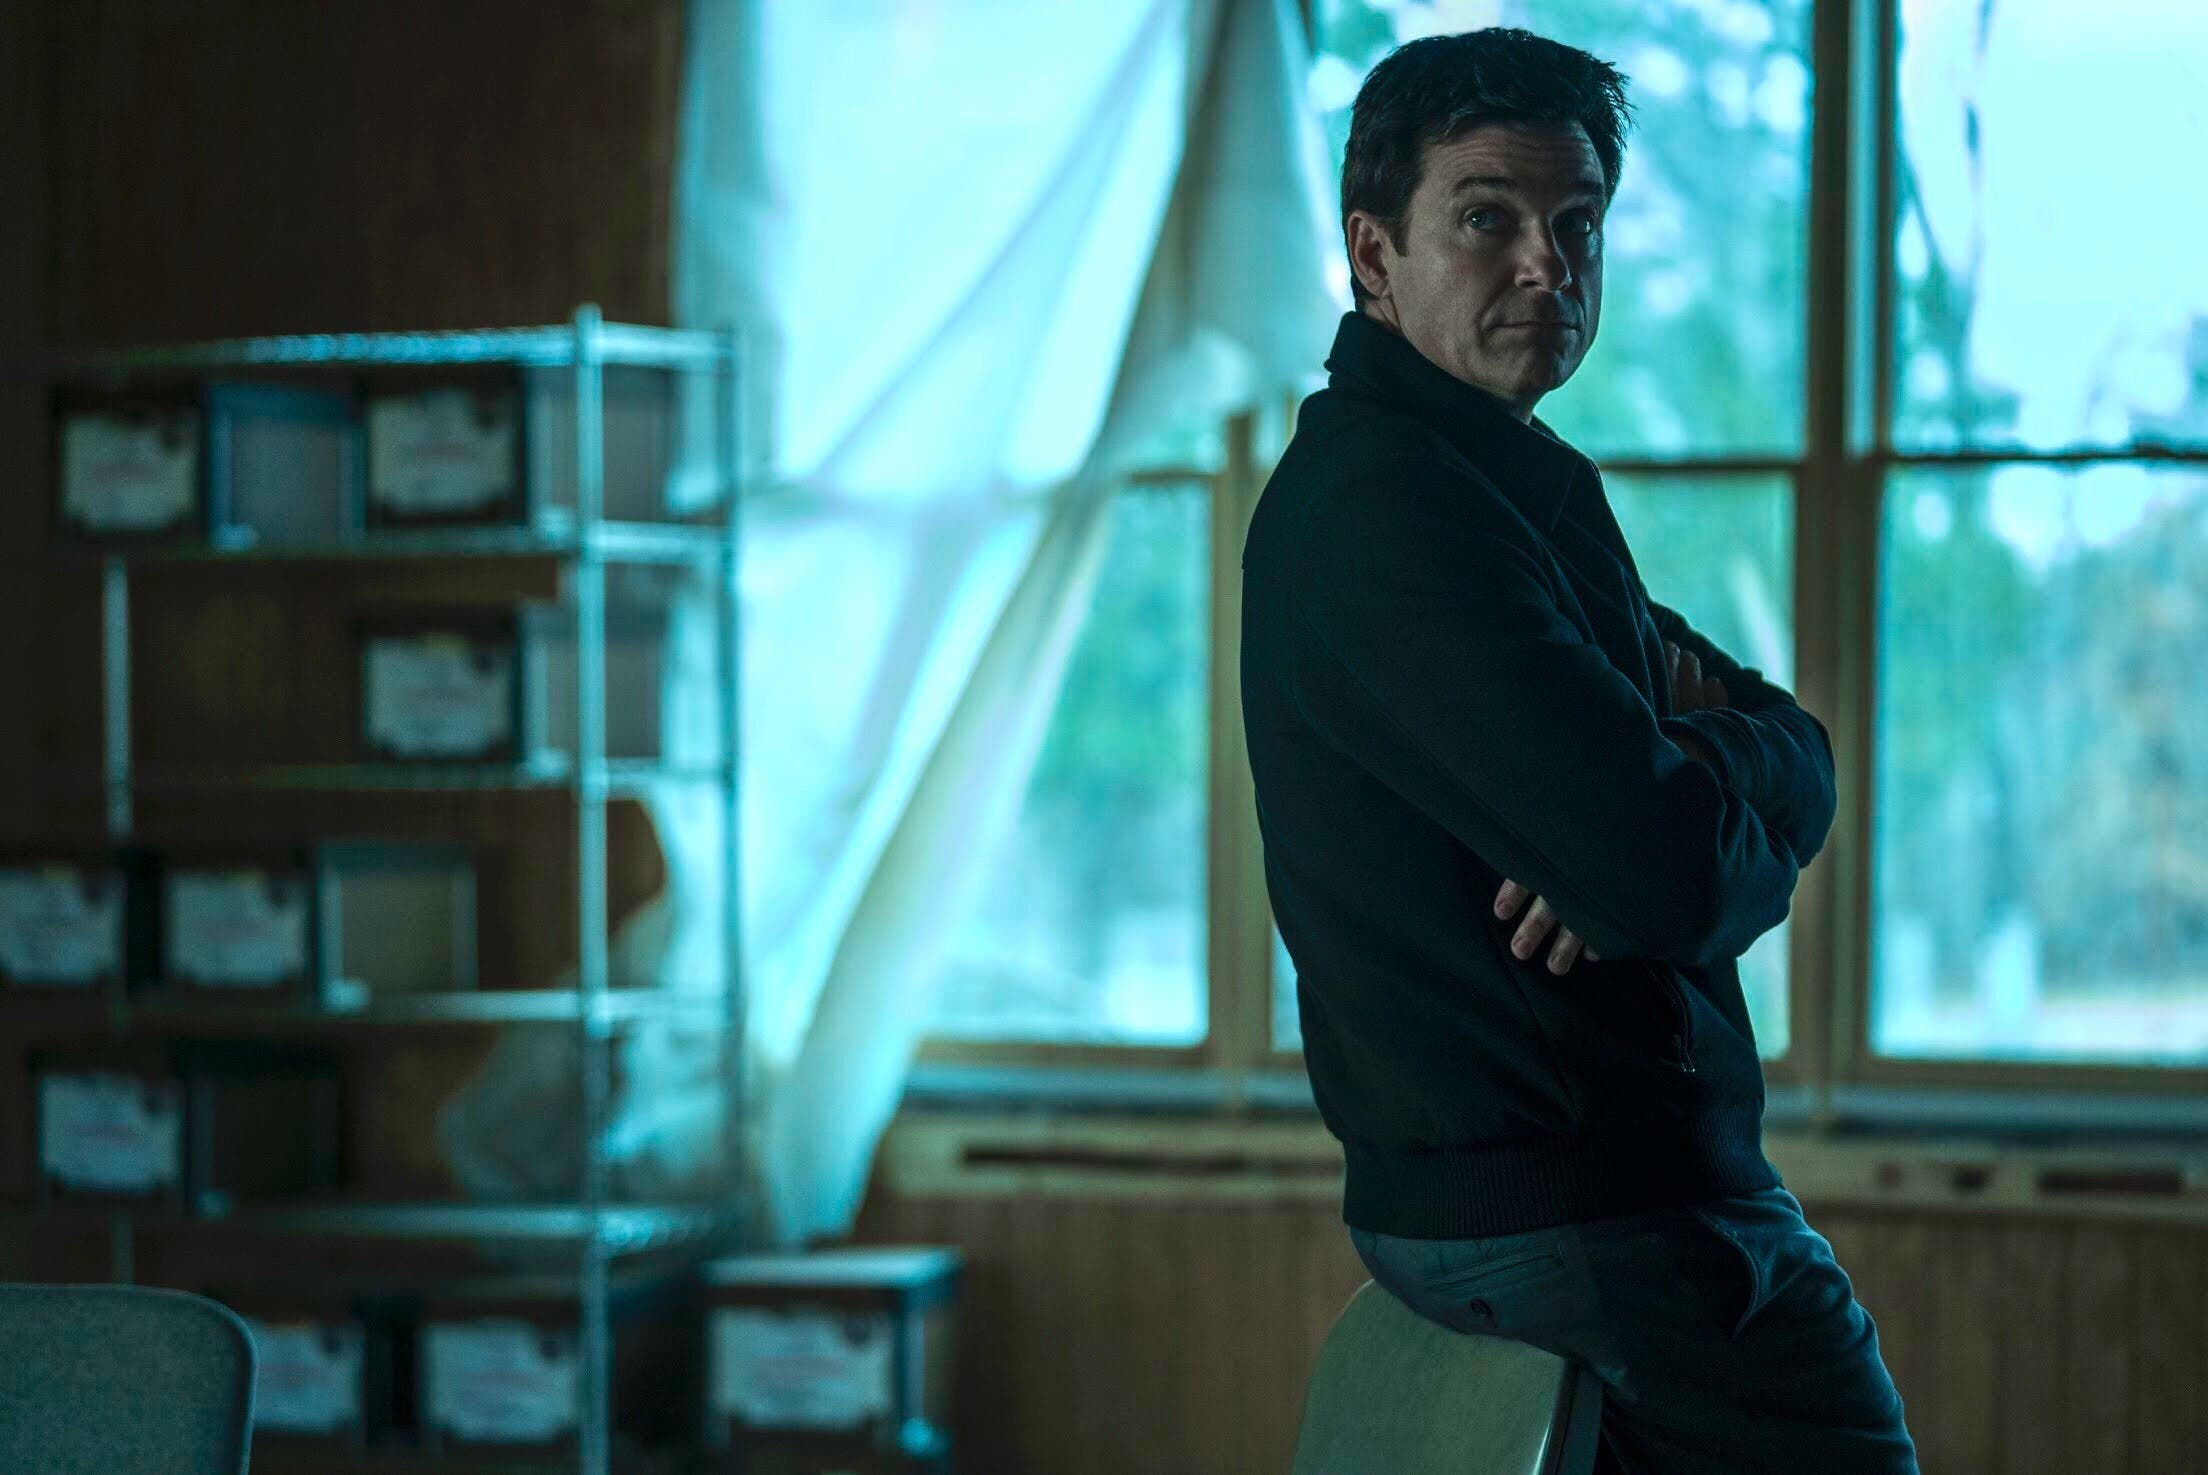 Jason Bateman on Ozark season 2: My character is not as smart as he thinks he is